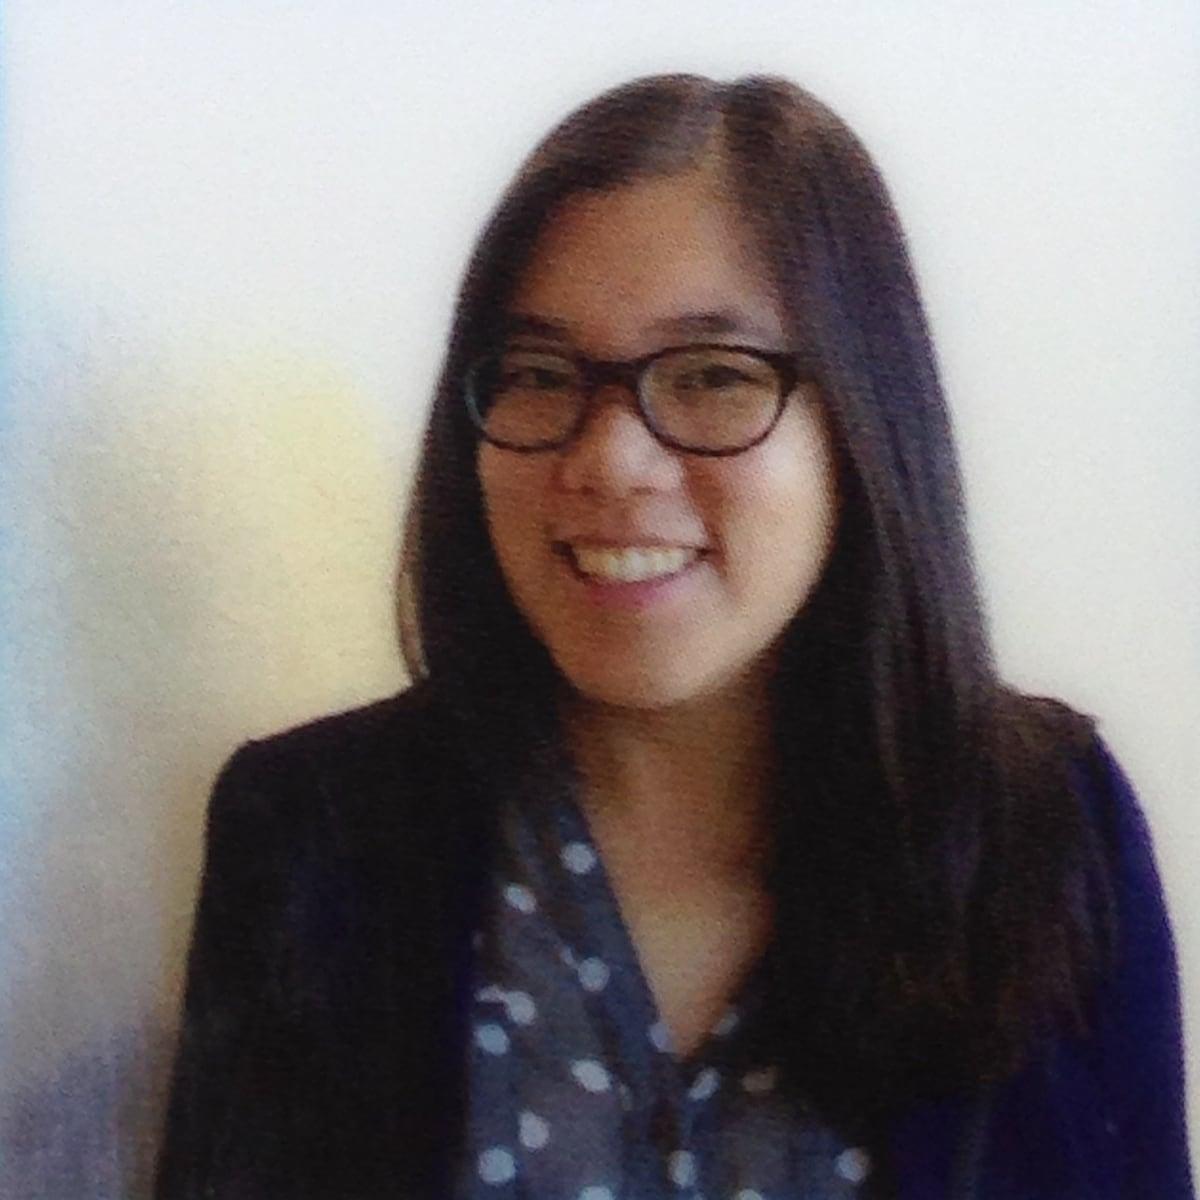 Dominique From San Mateo, CA